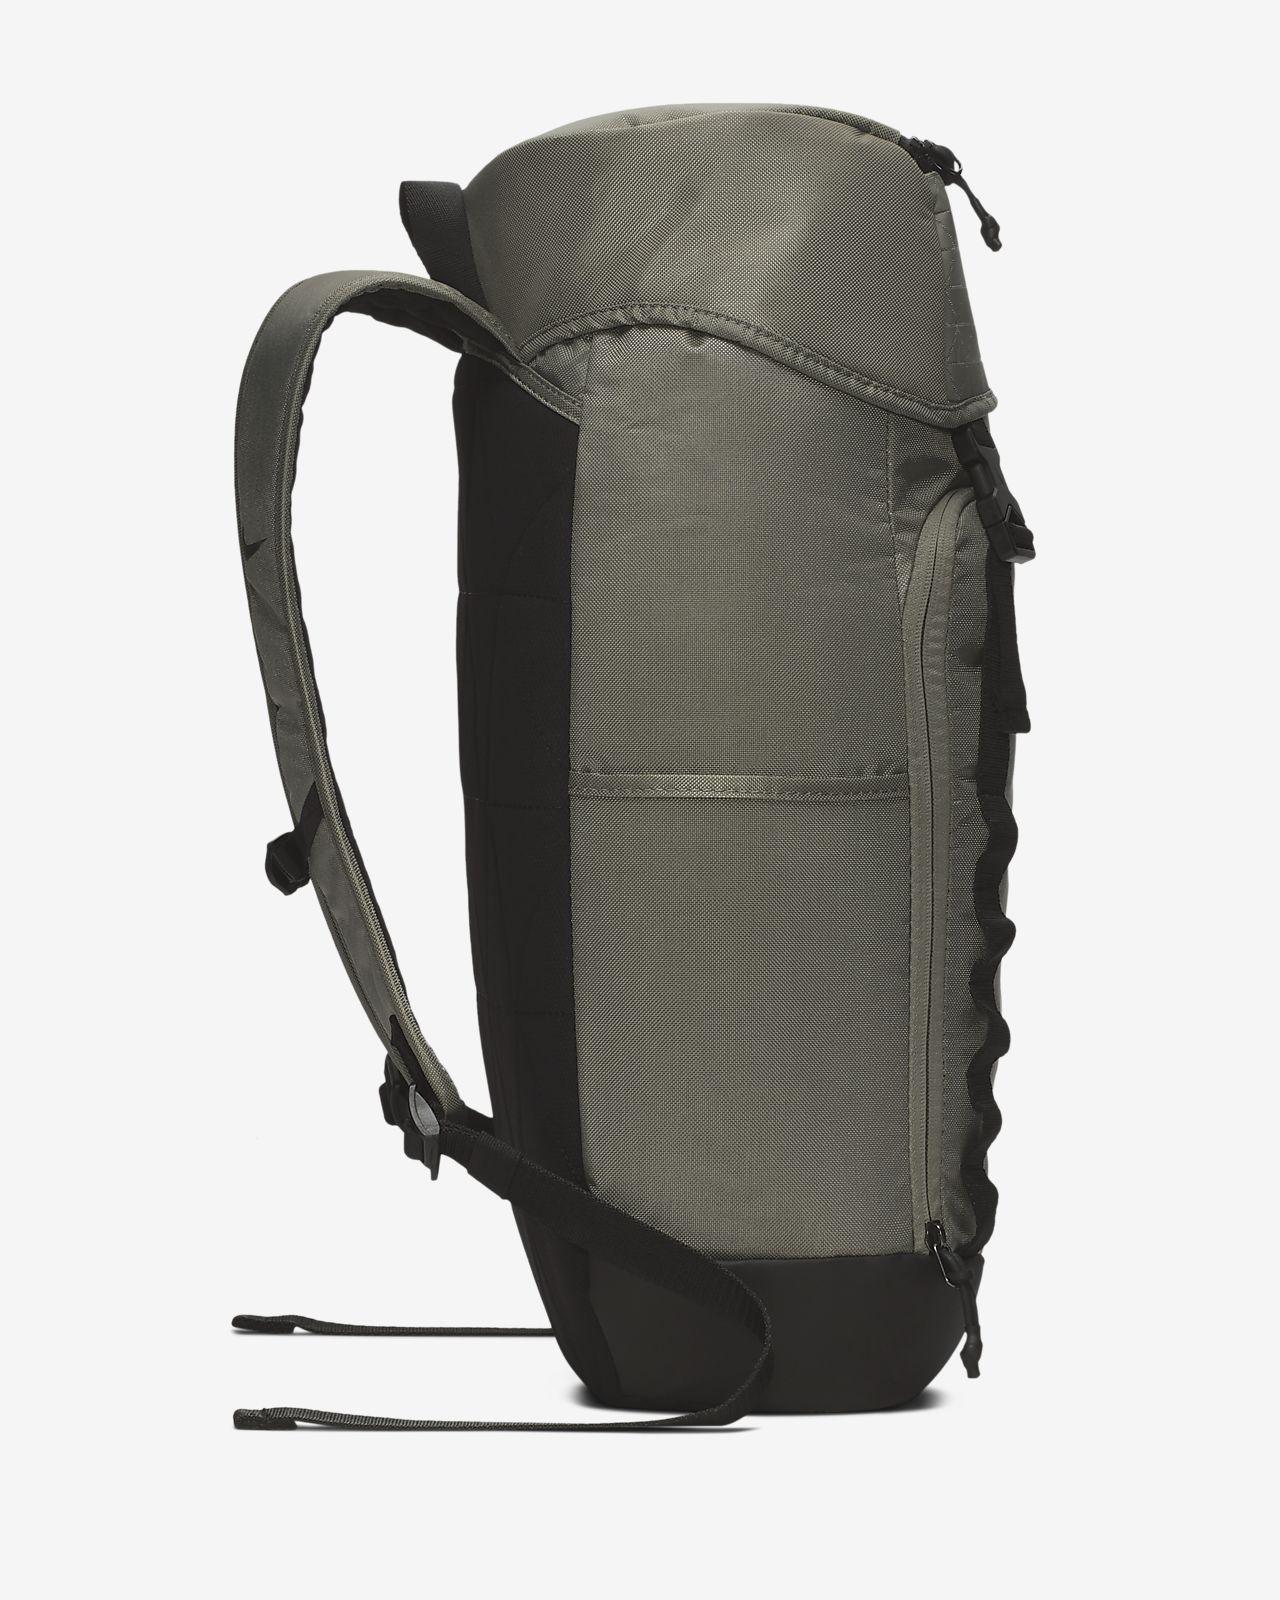 473590c35c384 Nike Vapor Speed 2.0 Training Backpack. Nike.com IN